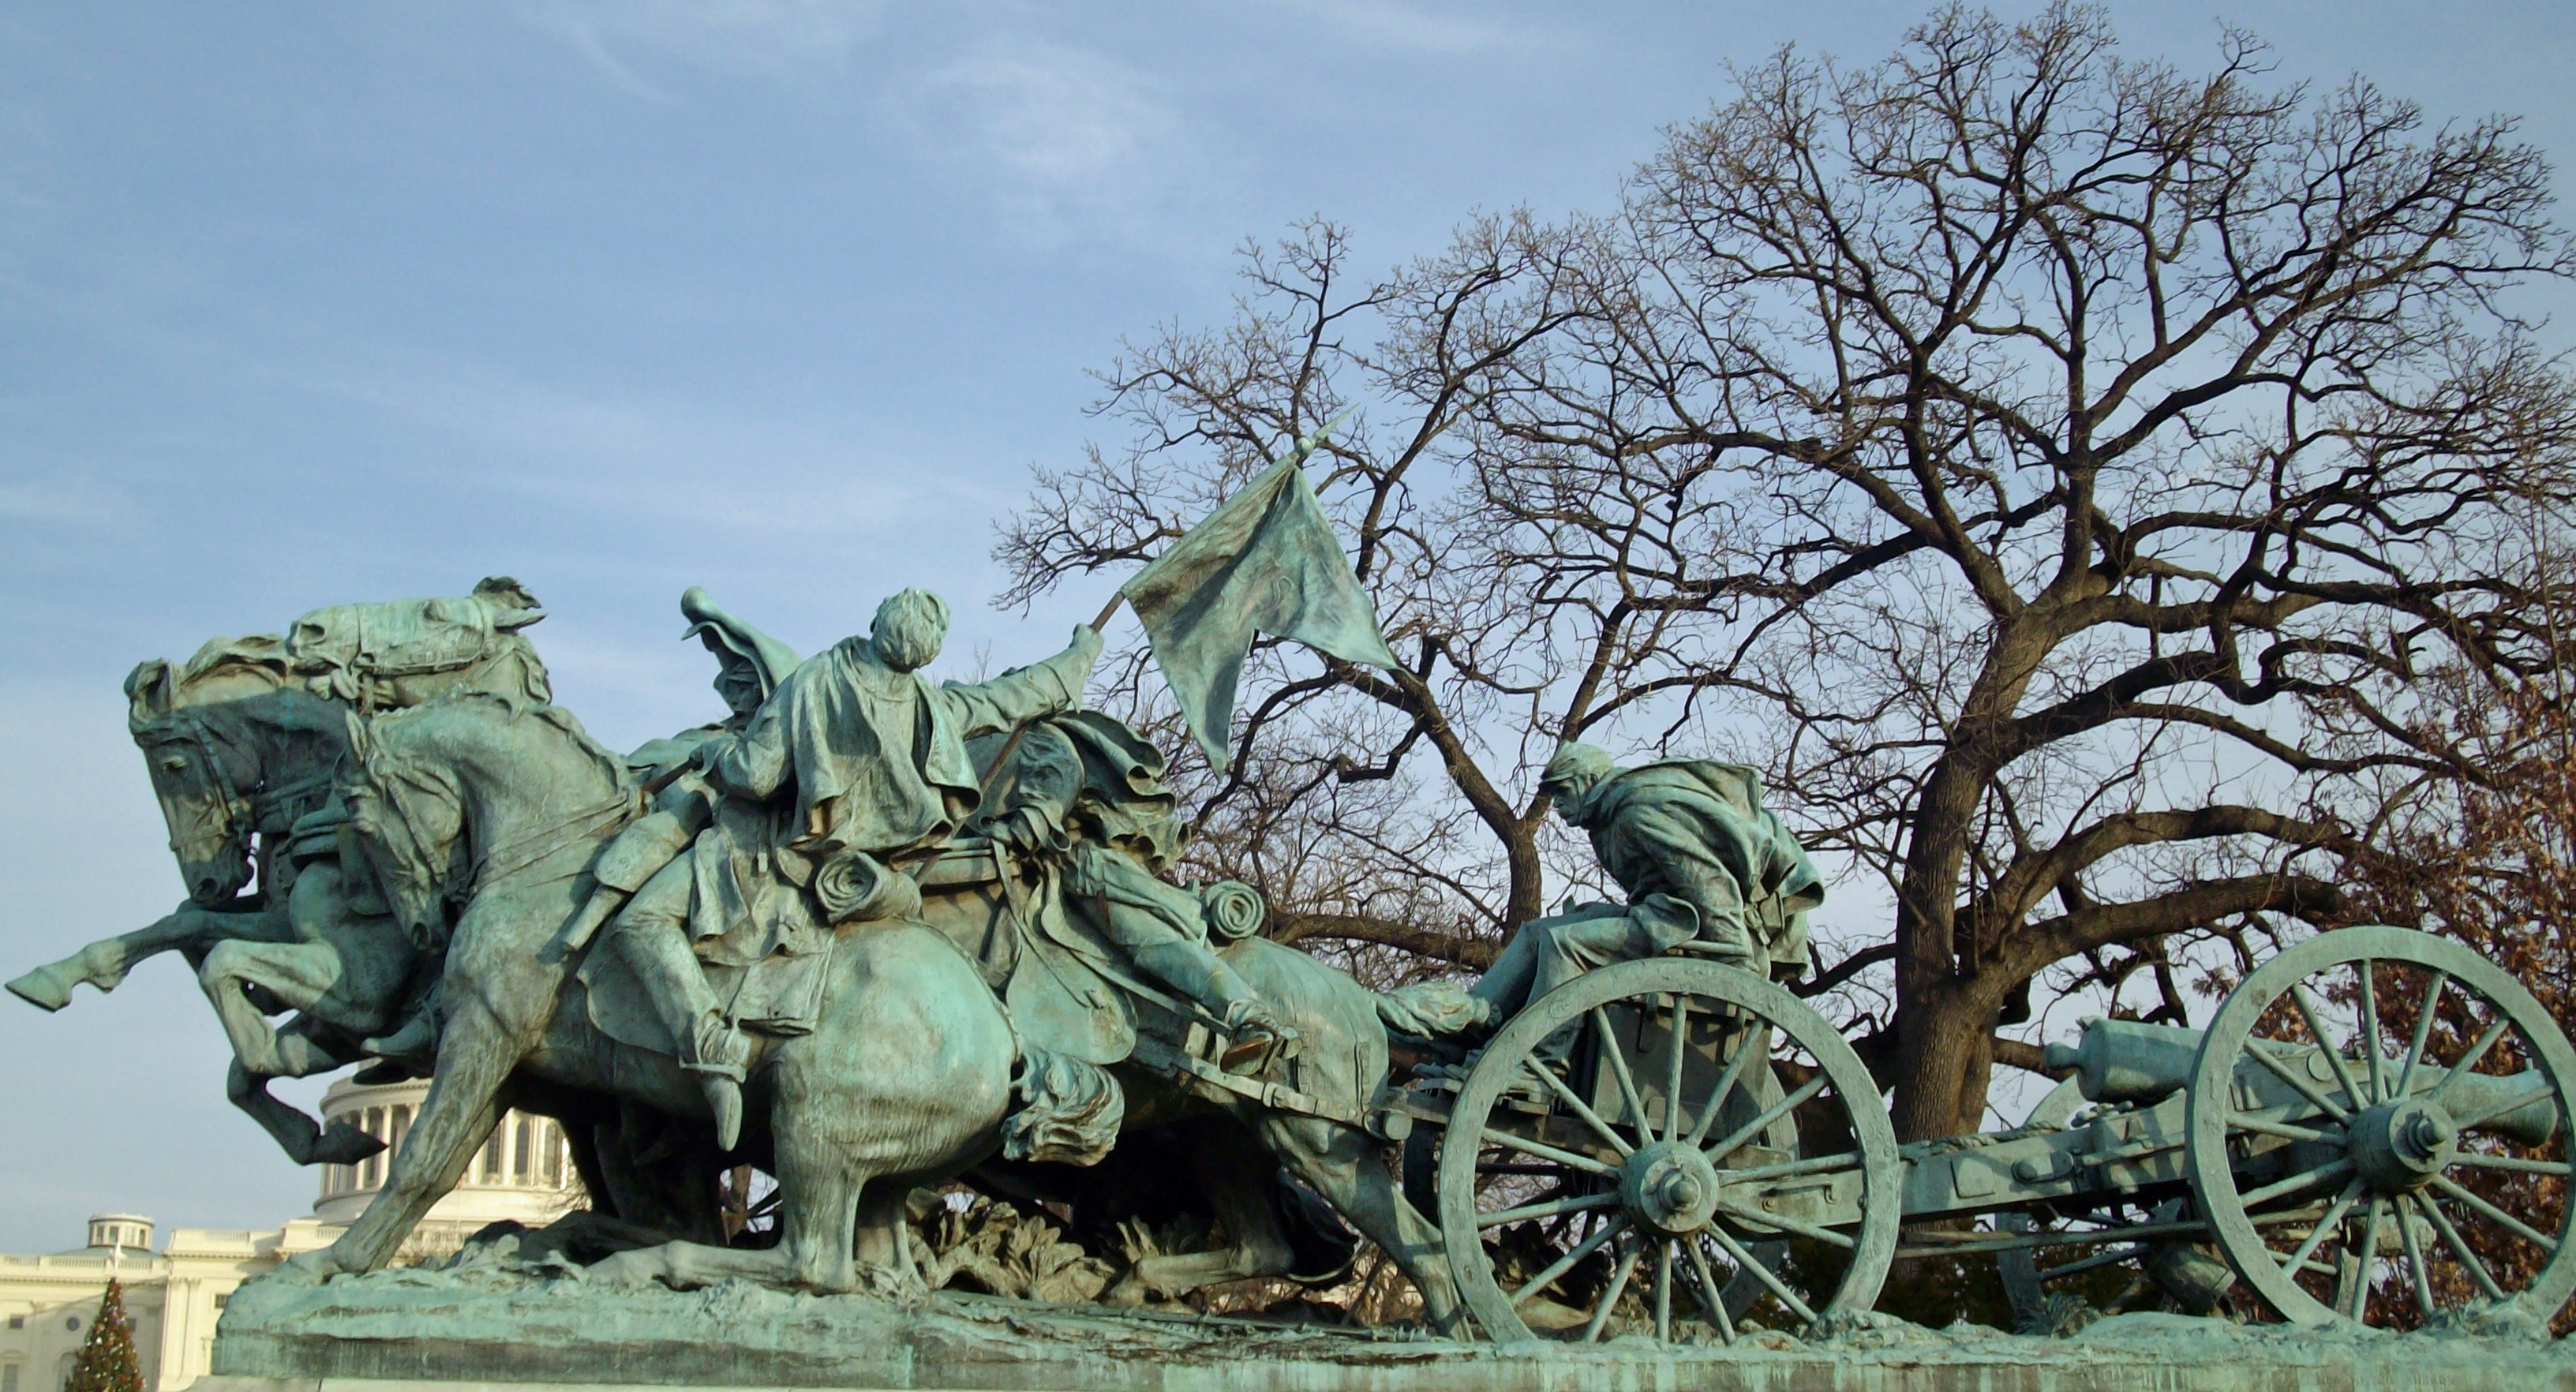 Gen. Ulysses S. Grant Memorial is thrilling - |